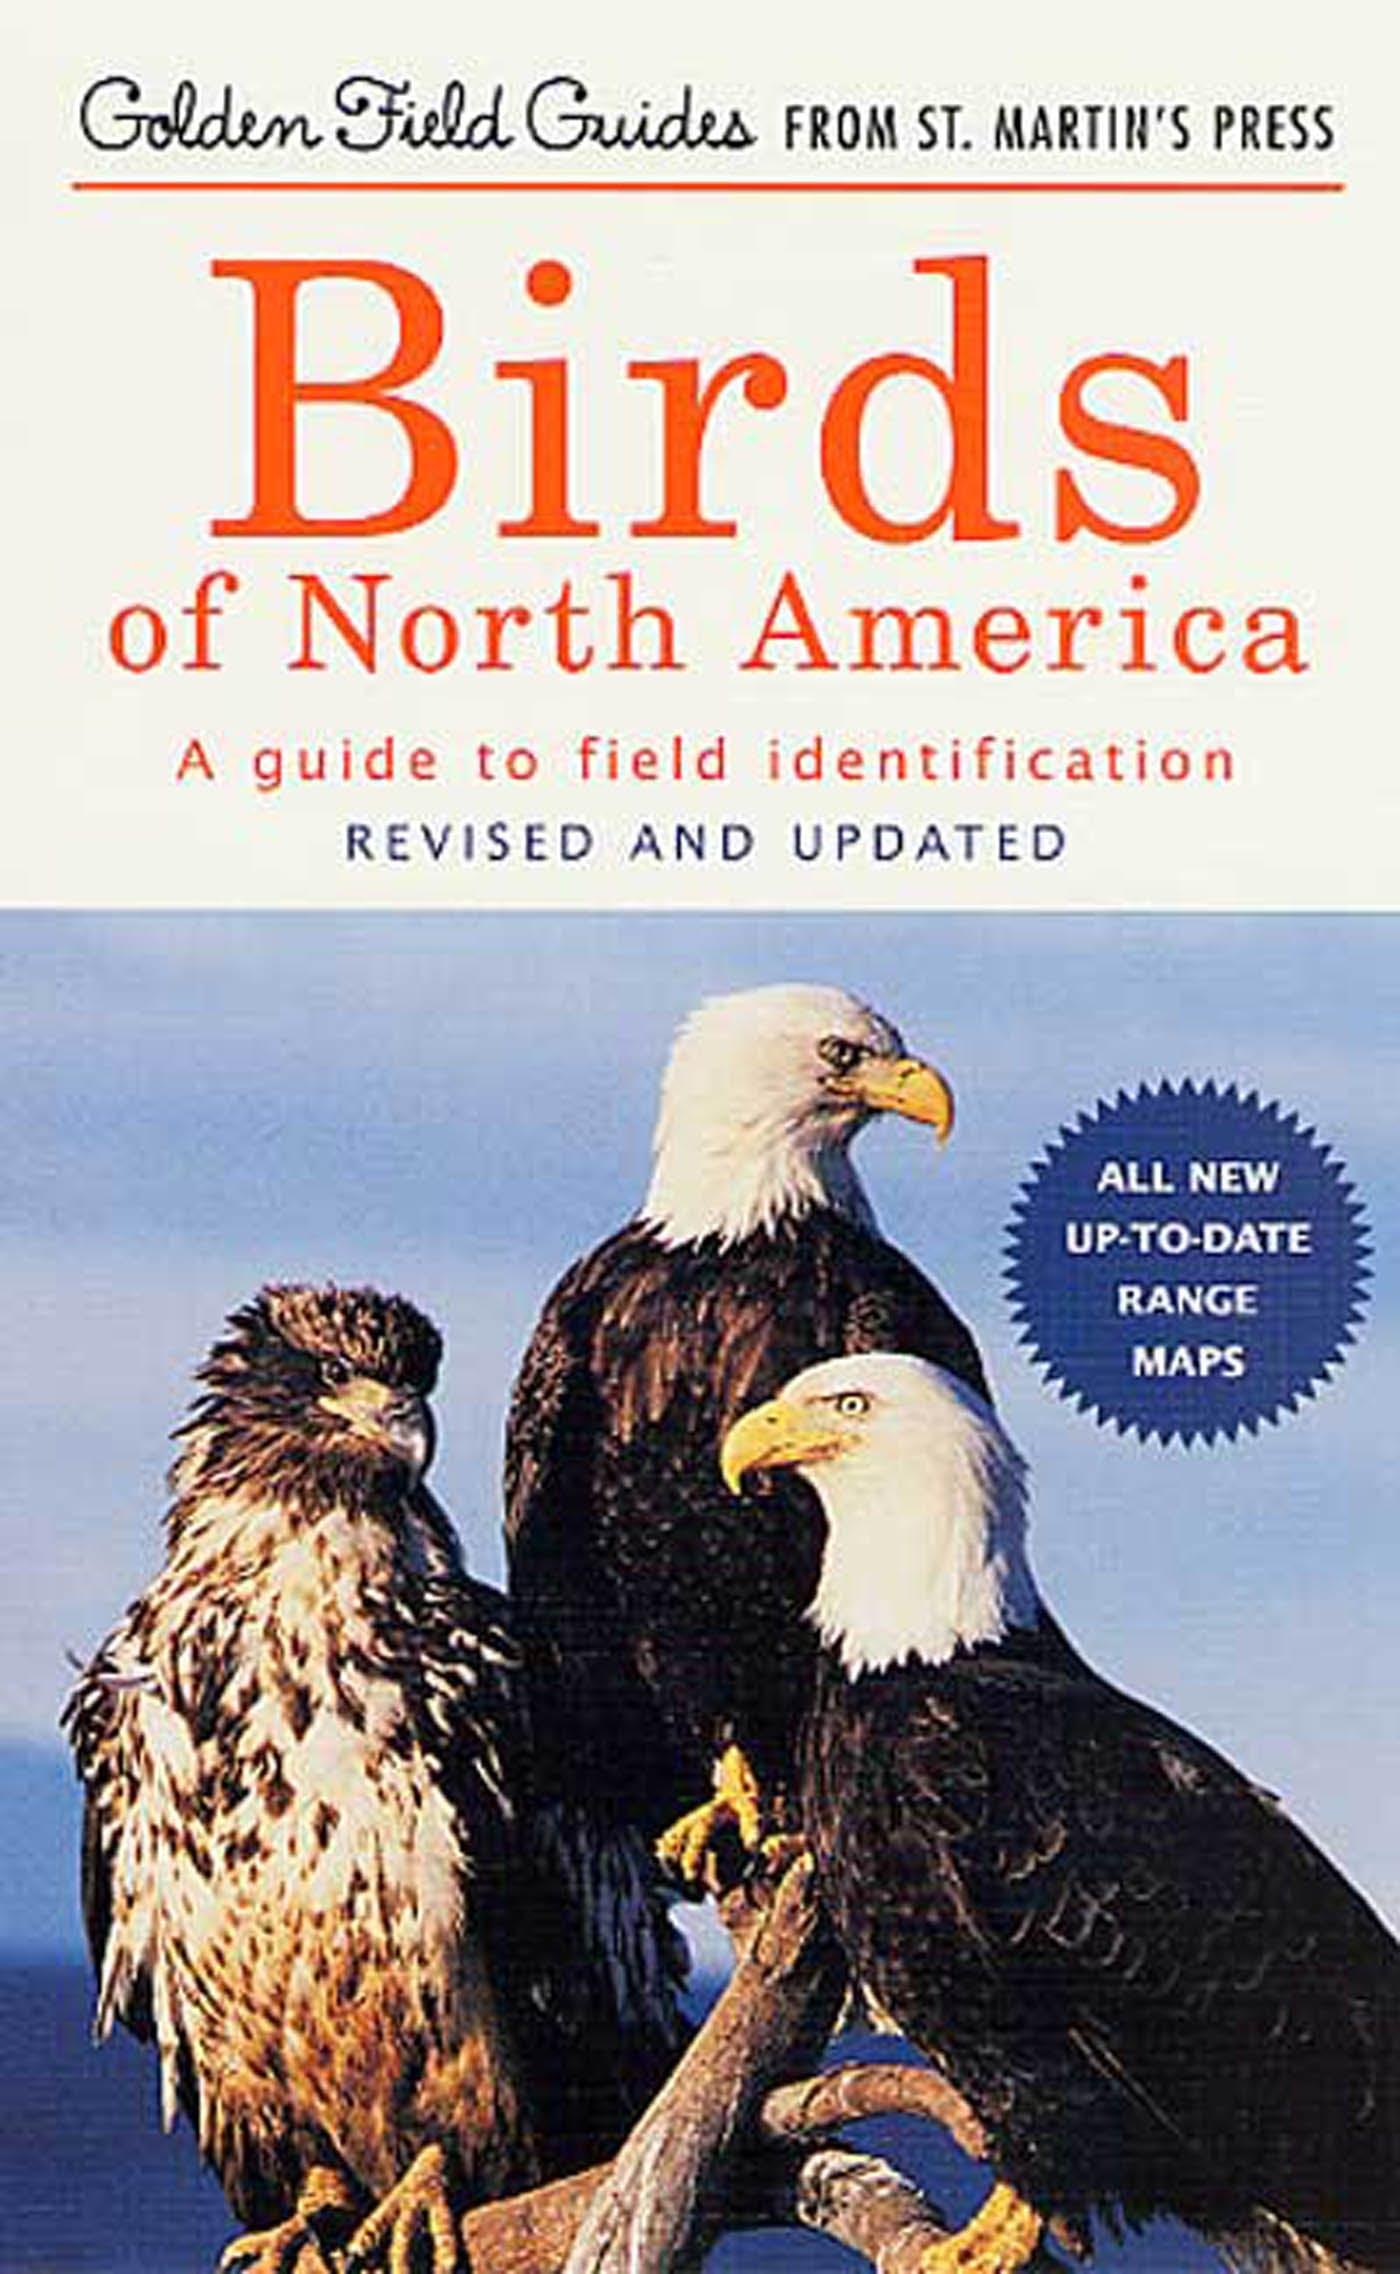 Image of Birds of North America